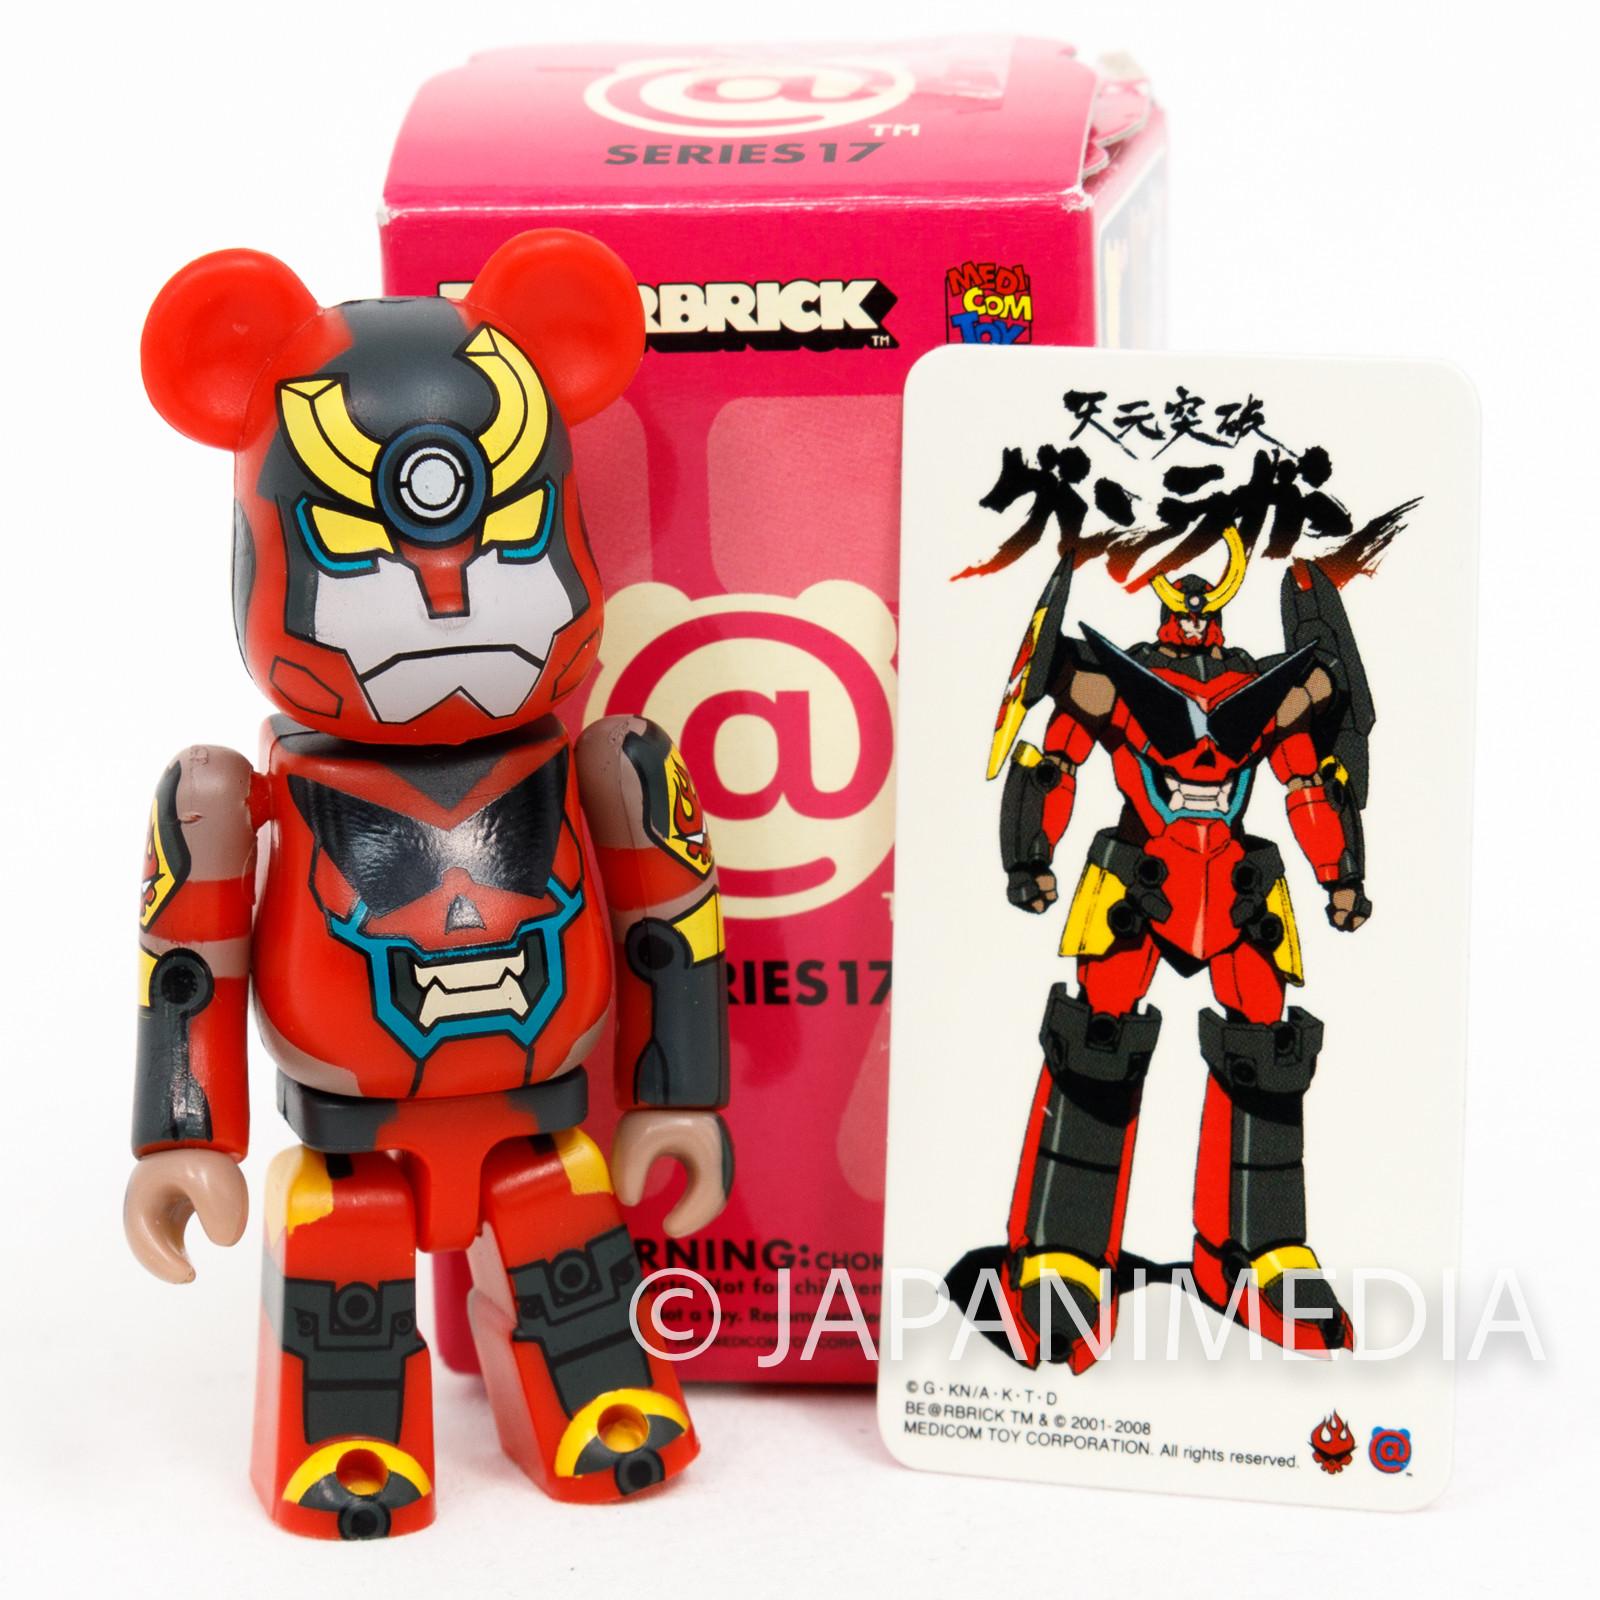 Gurren Lagann BE@RBRICK Bearbrick Figure Medicom Toy JAPAN ANIME MANGA